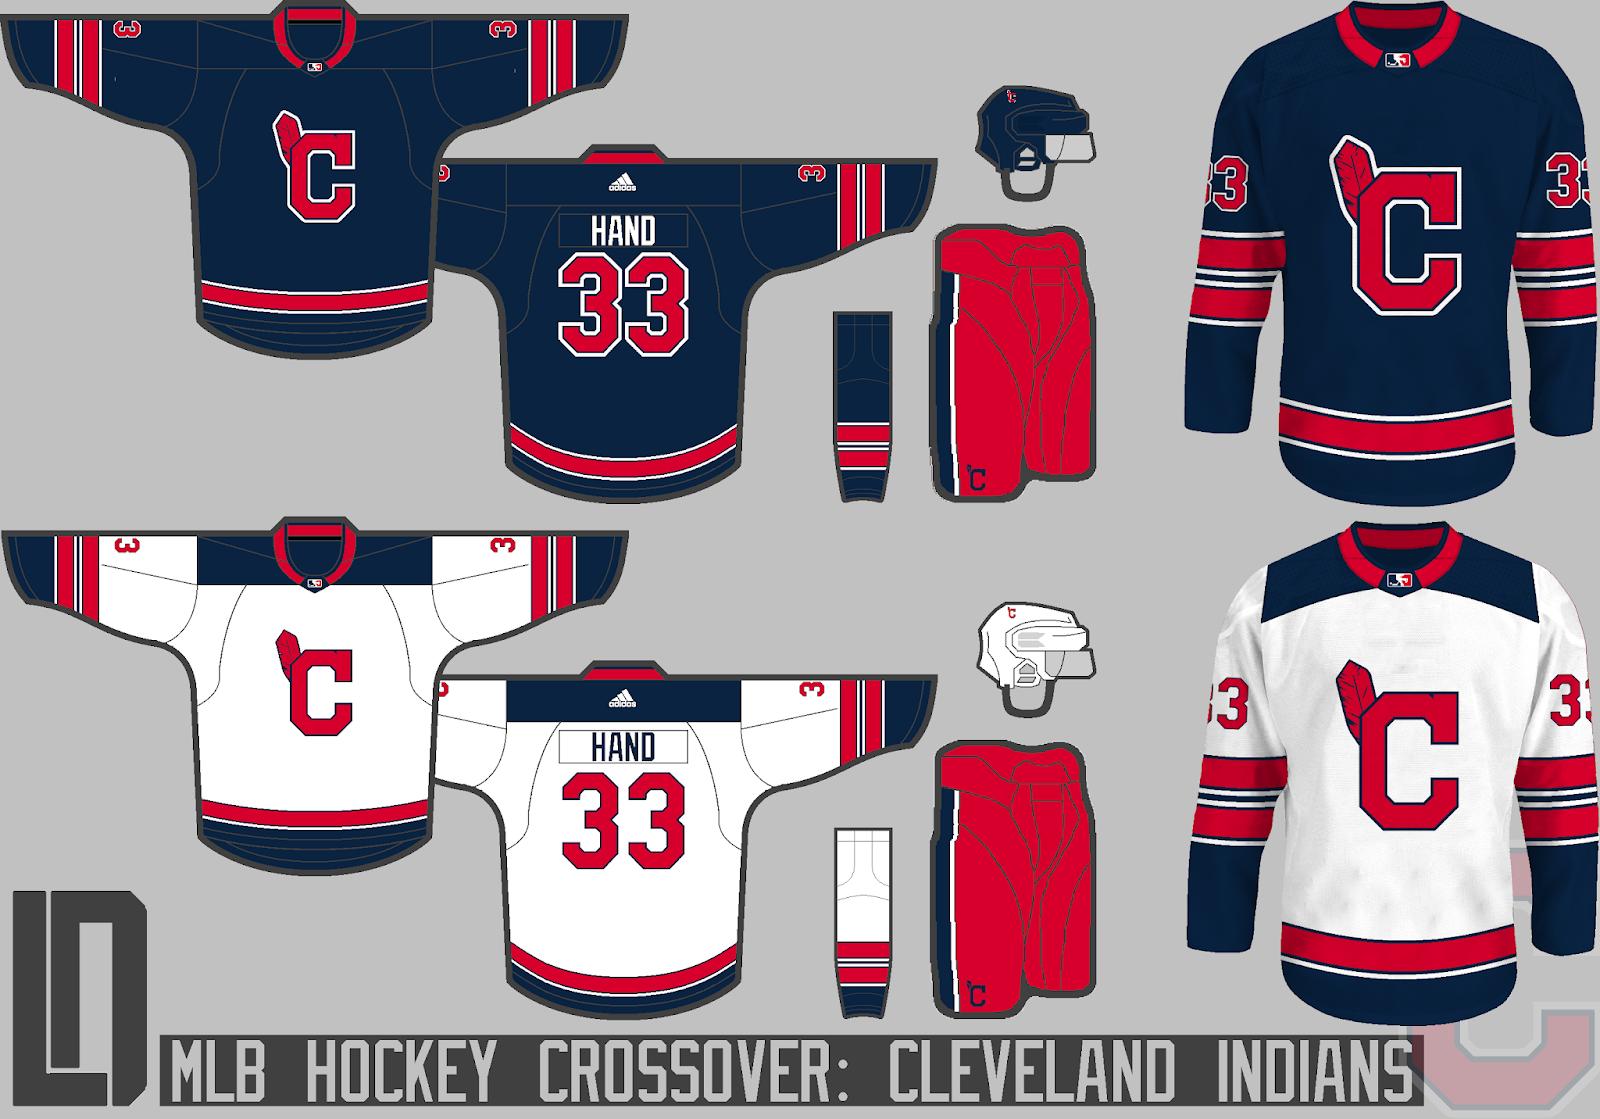 Cleveland+Indians+Concept.png